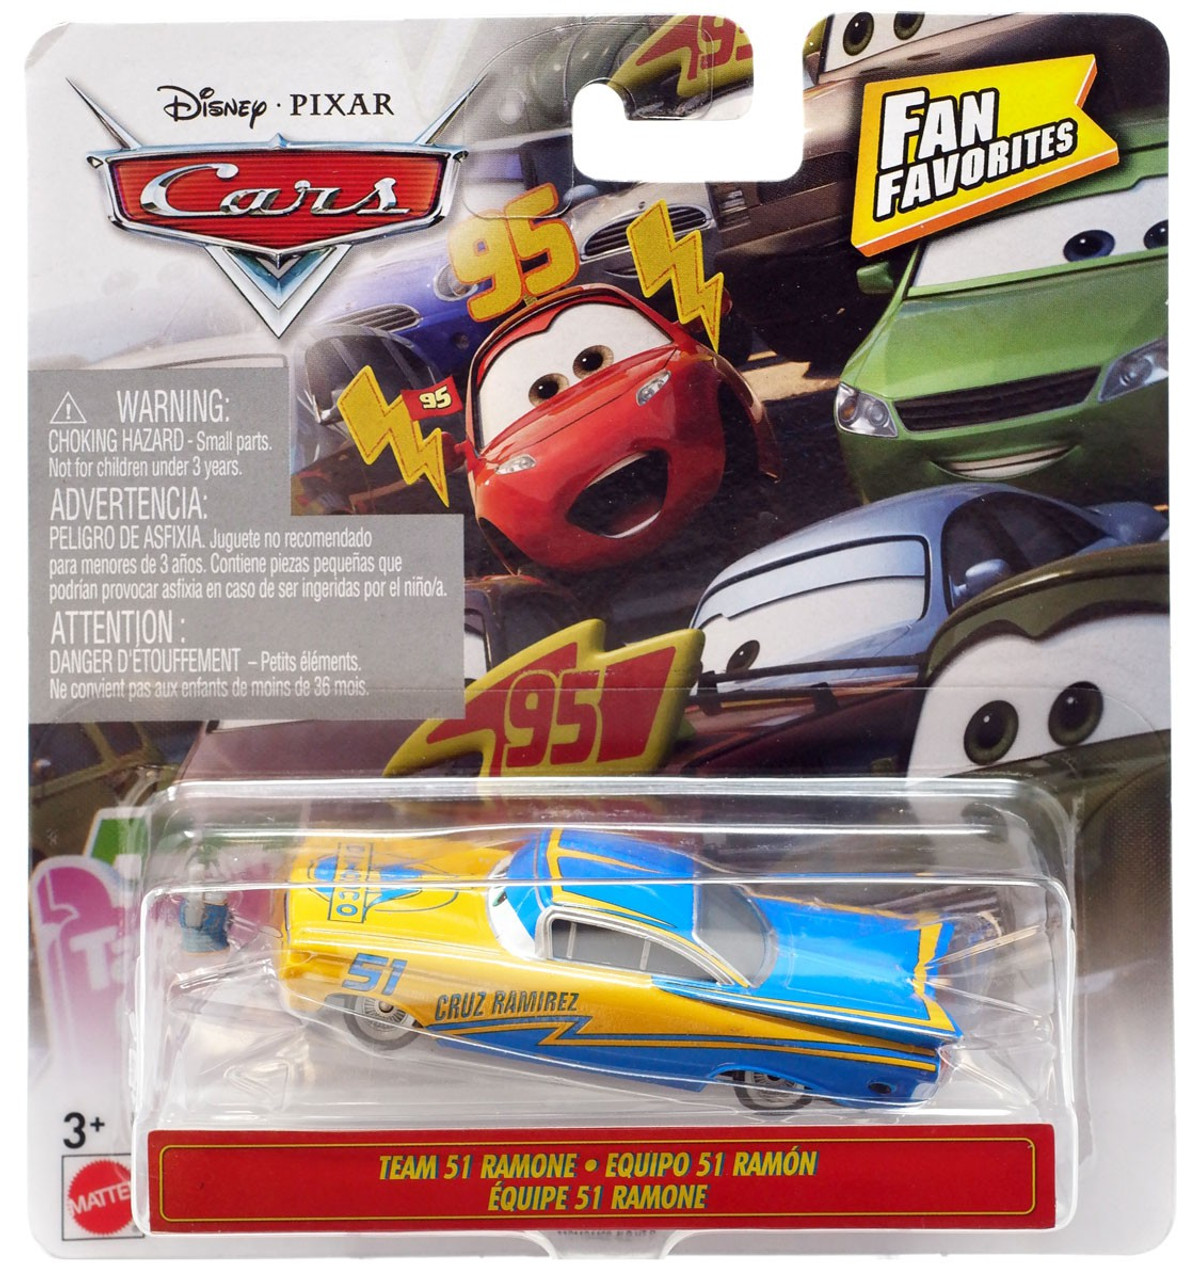 Disney Pixar Cars Fan Favorites Team 51 Ramone 155 Diecast Car